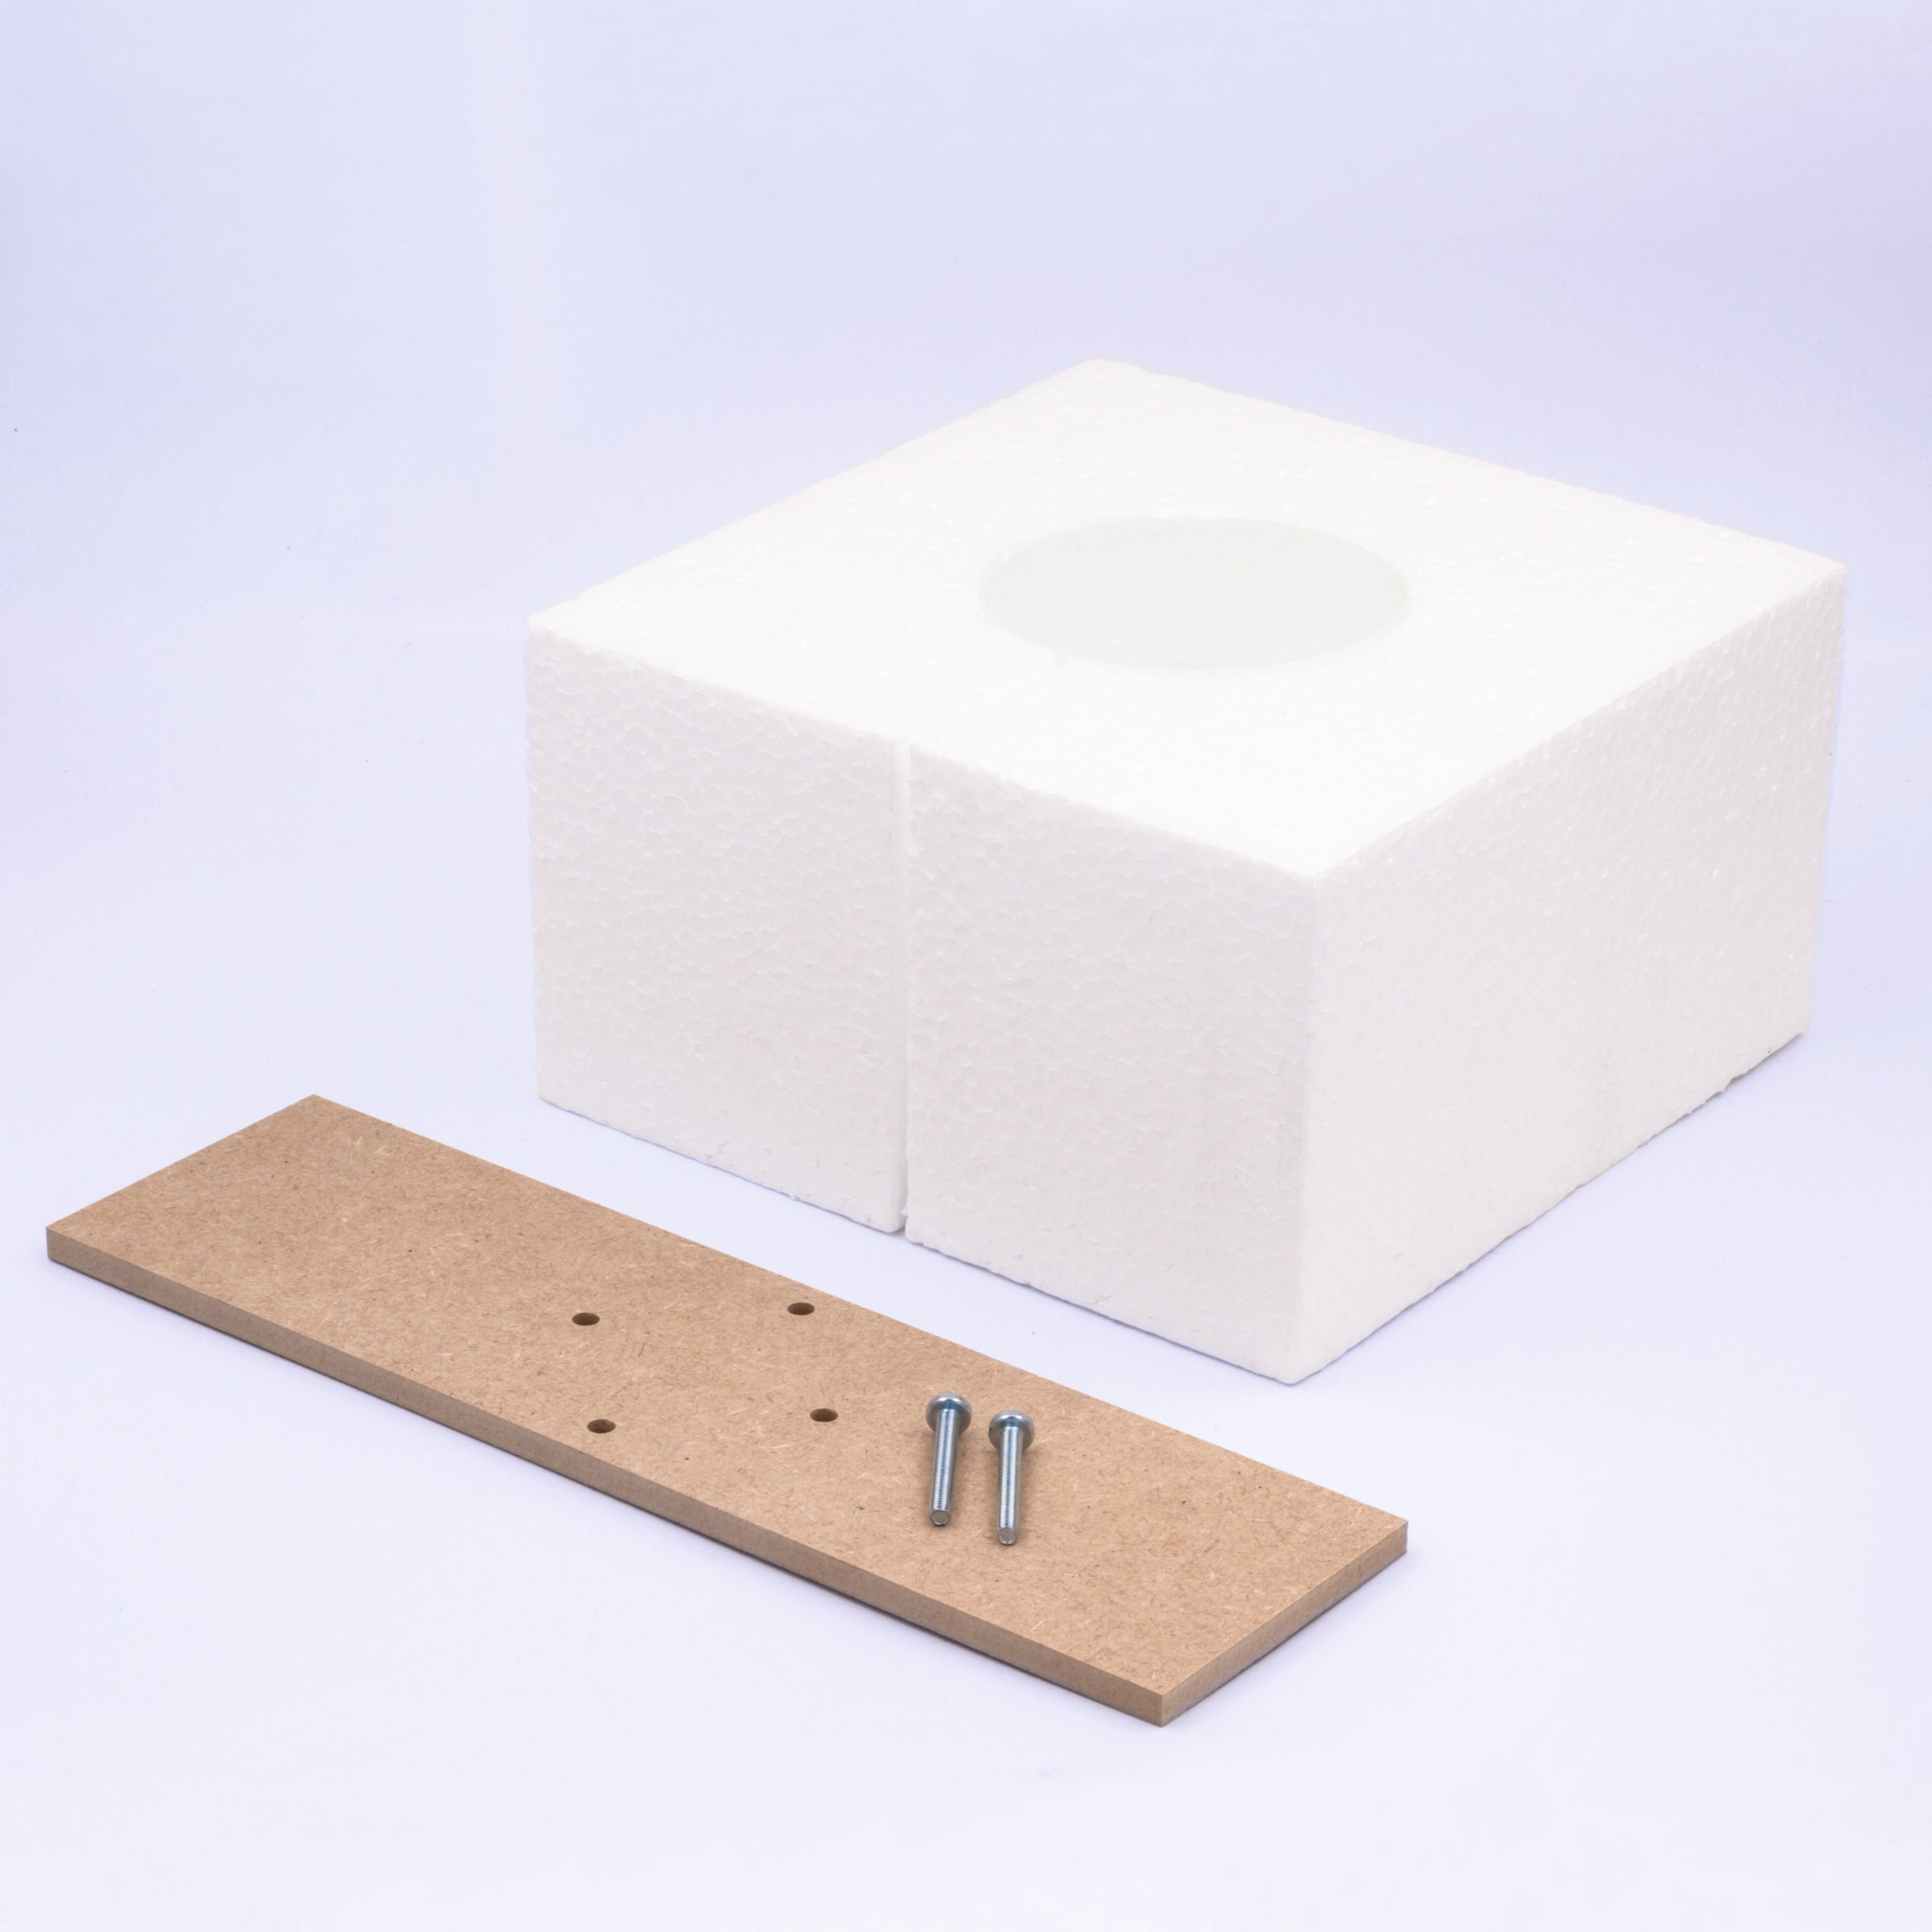 Kit Reservation Prise Au Sol Polystyrene Blanc Leroy Merlin